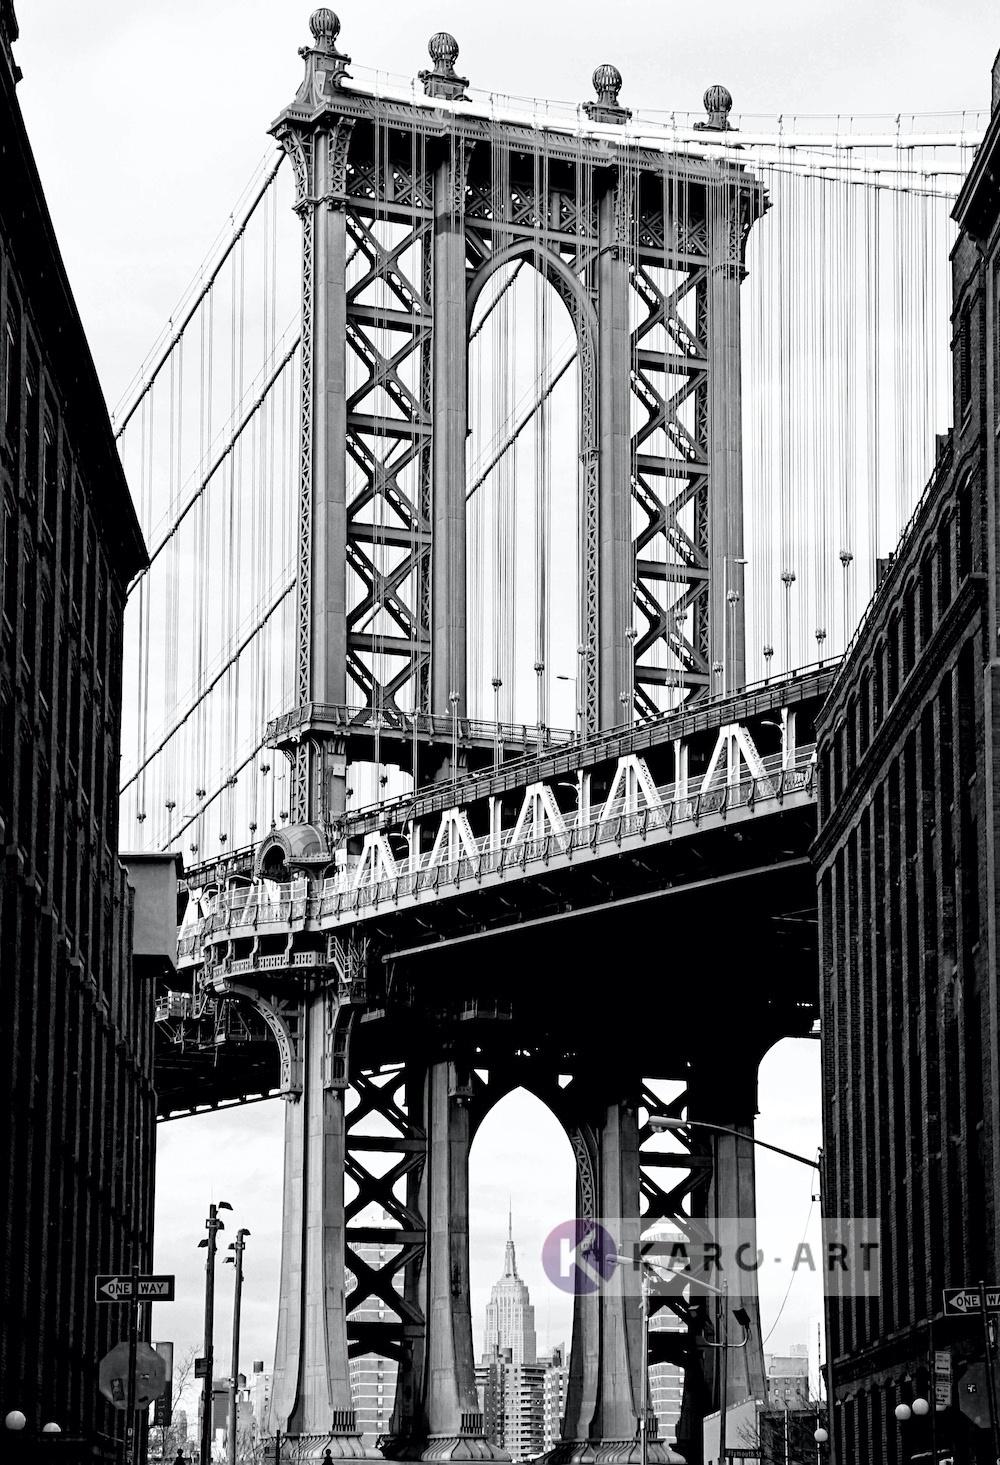 Afbeelding op acrylglas - Manhattan Bridge II